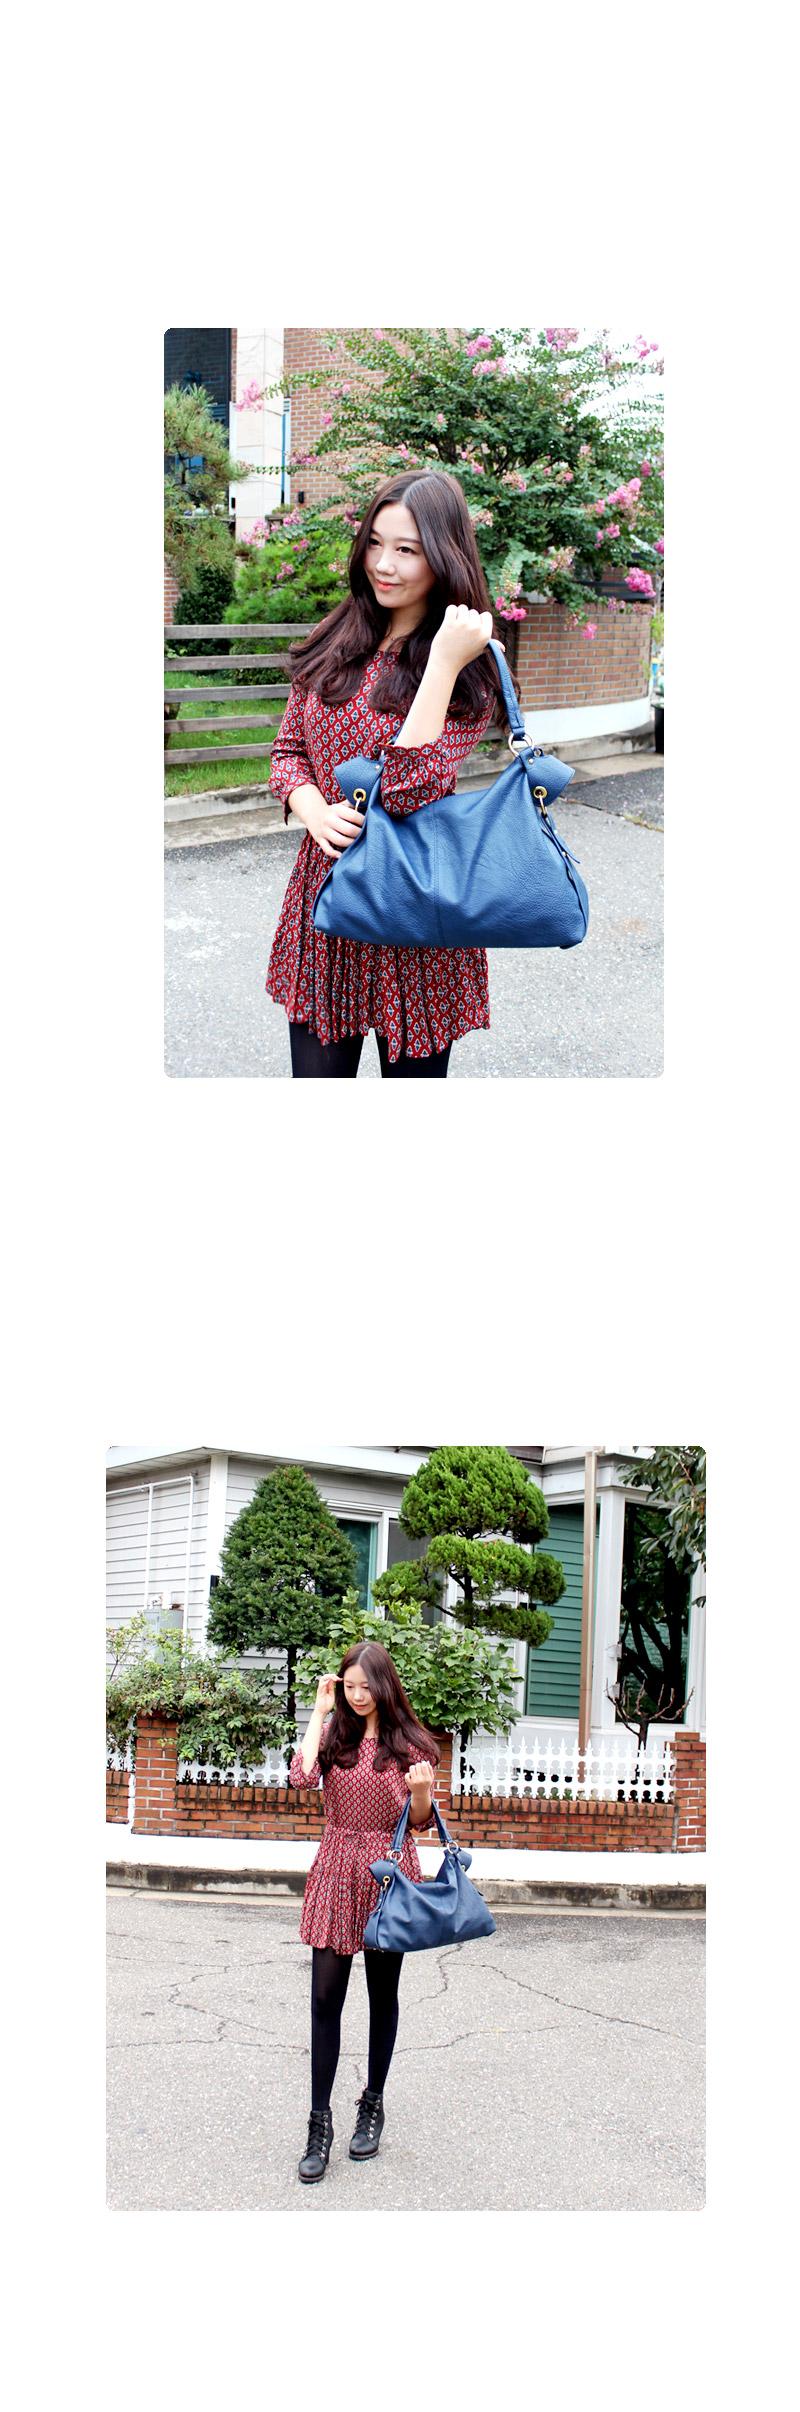 Shoulder&tote bag no. G18177view-M